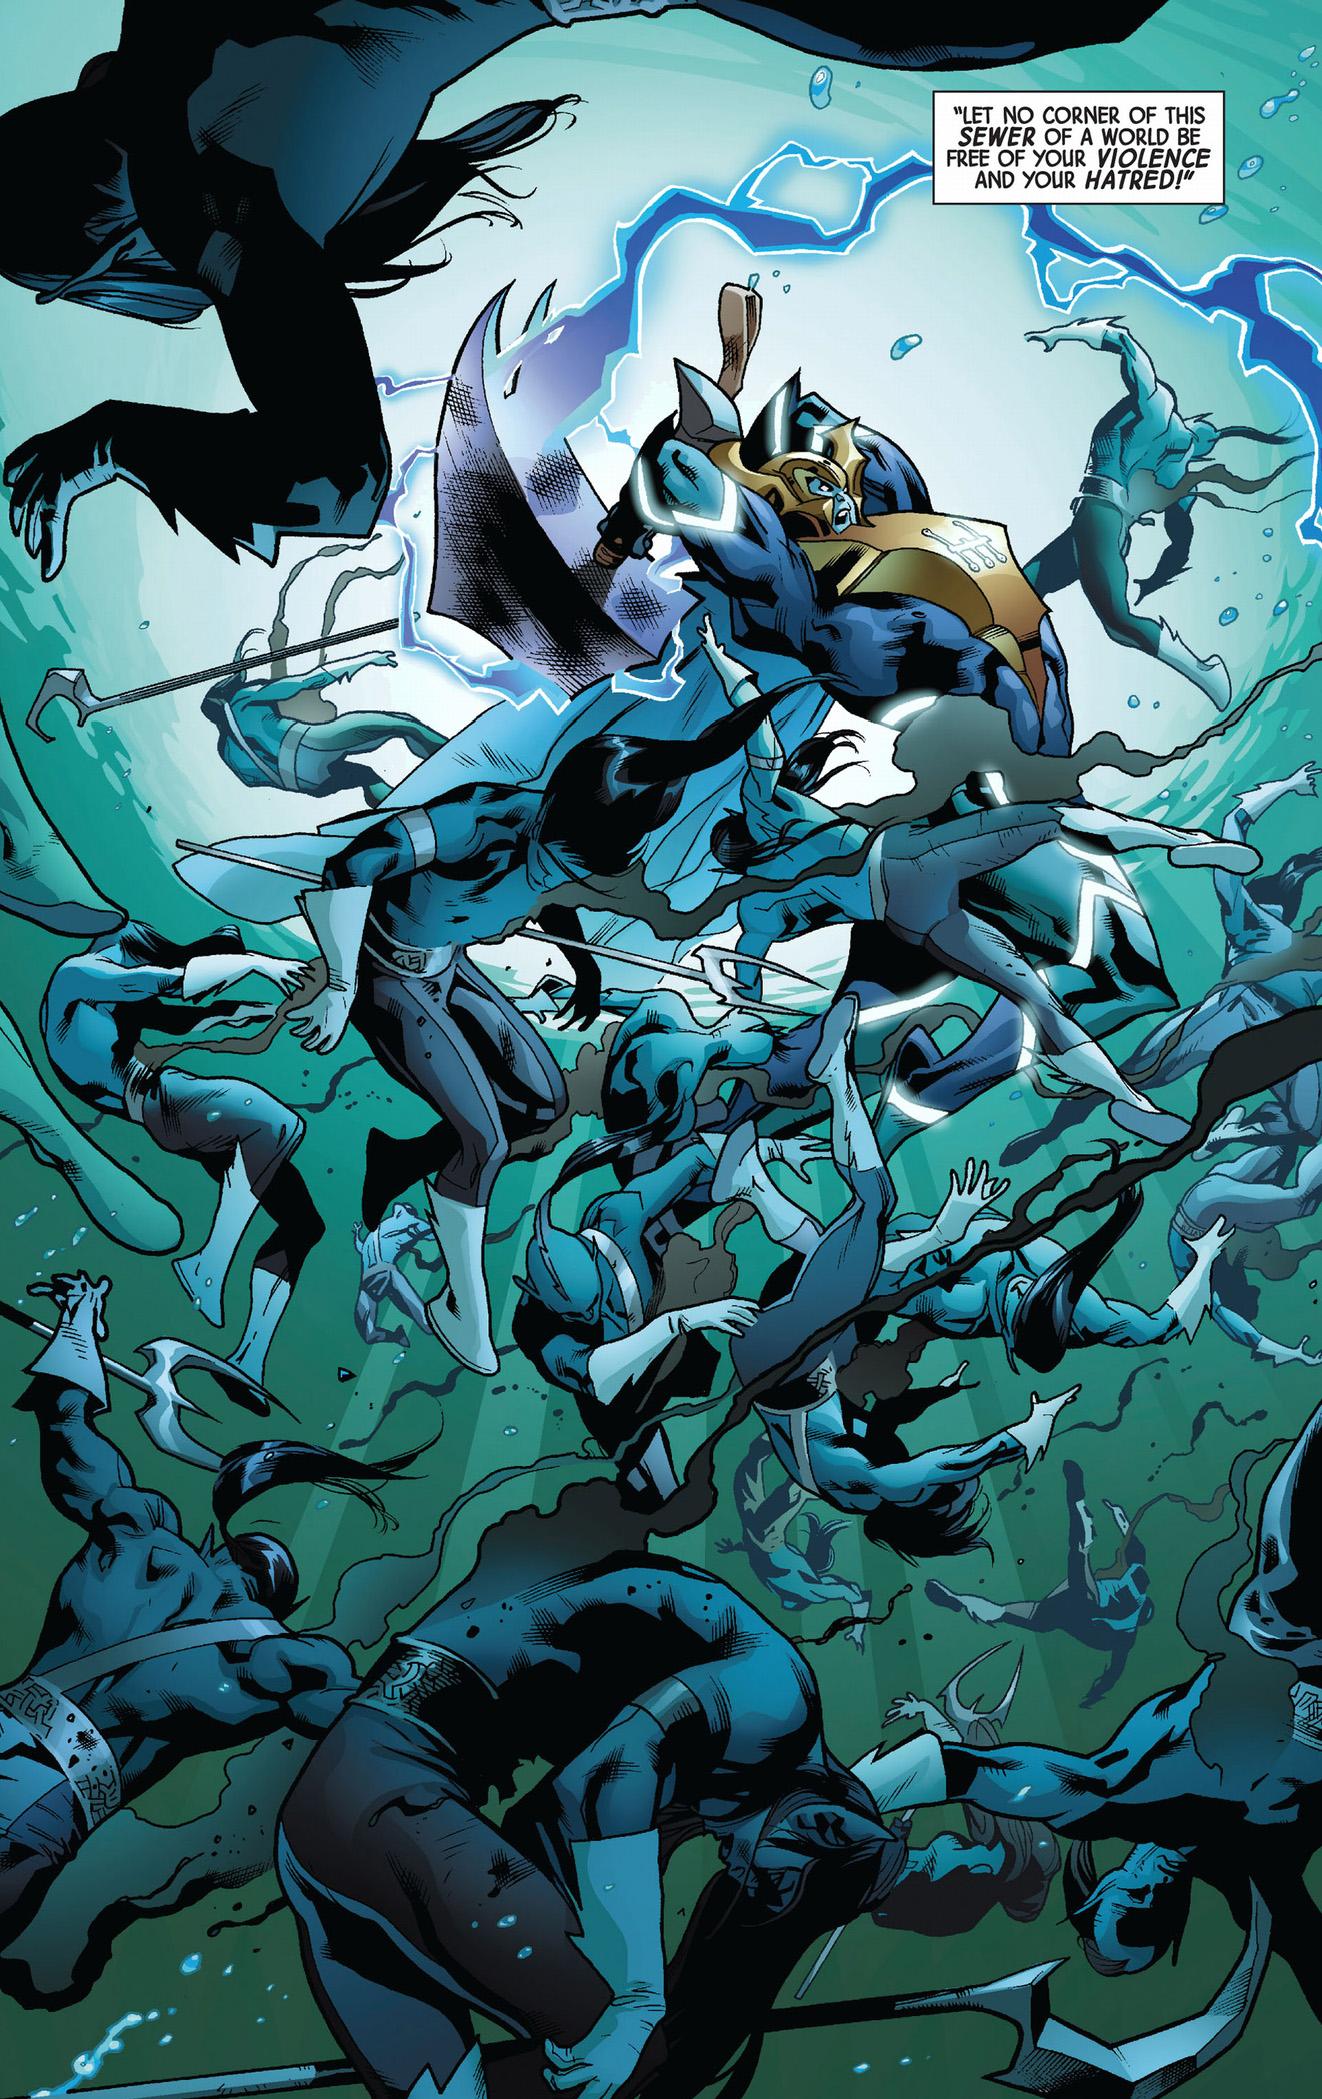 Nerkkod slaughters atlanteans